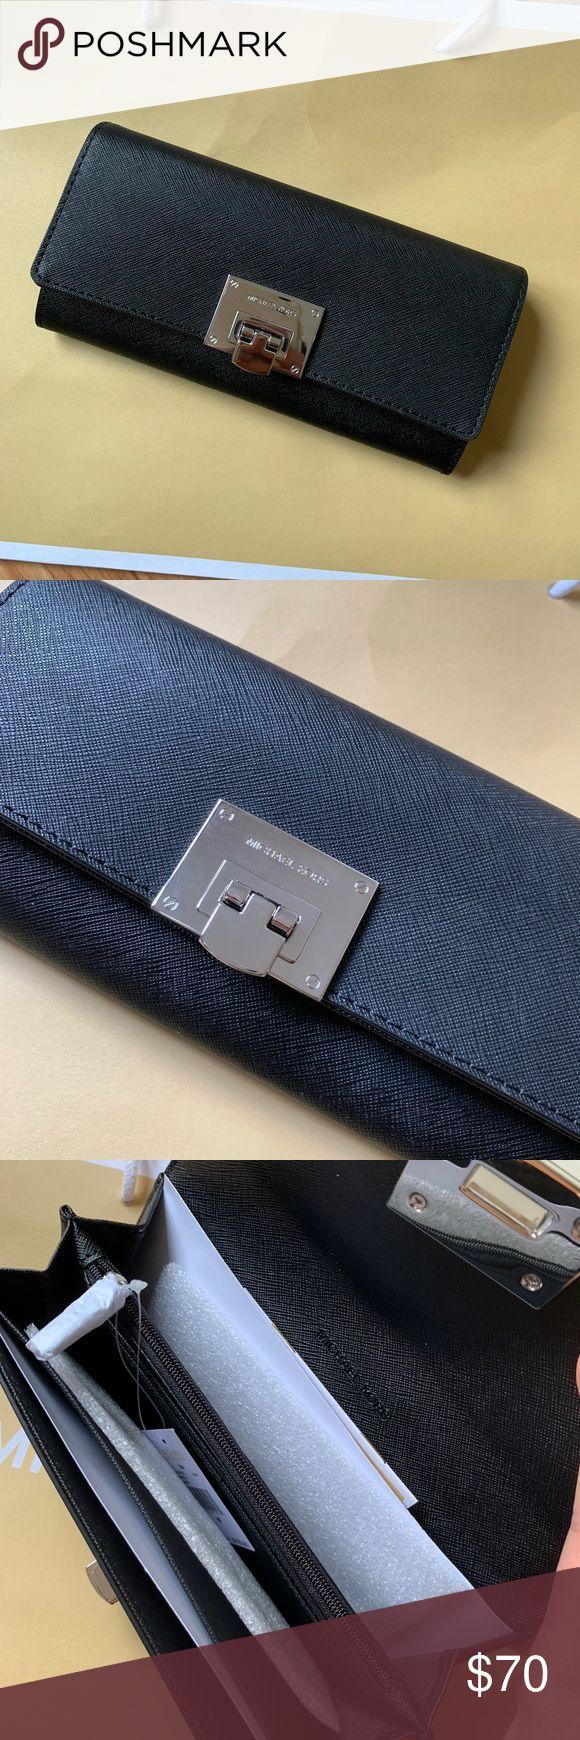 63f021fafd66 Michael Kors Tina Carryall Wallet Michael Kors Tina Carryall Continental  Saffiano Leather Clutch Wallet Msrp $178